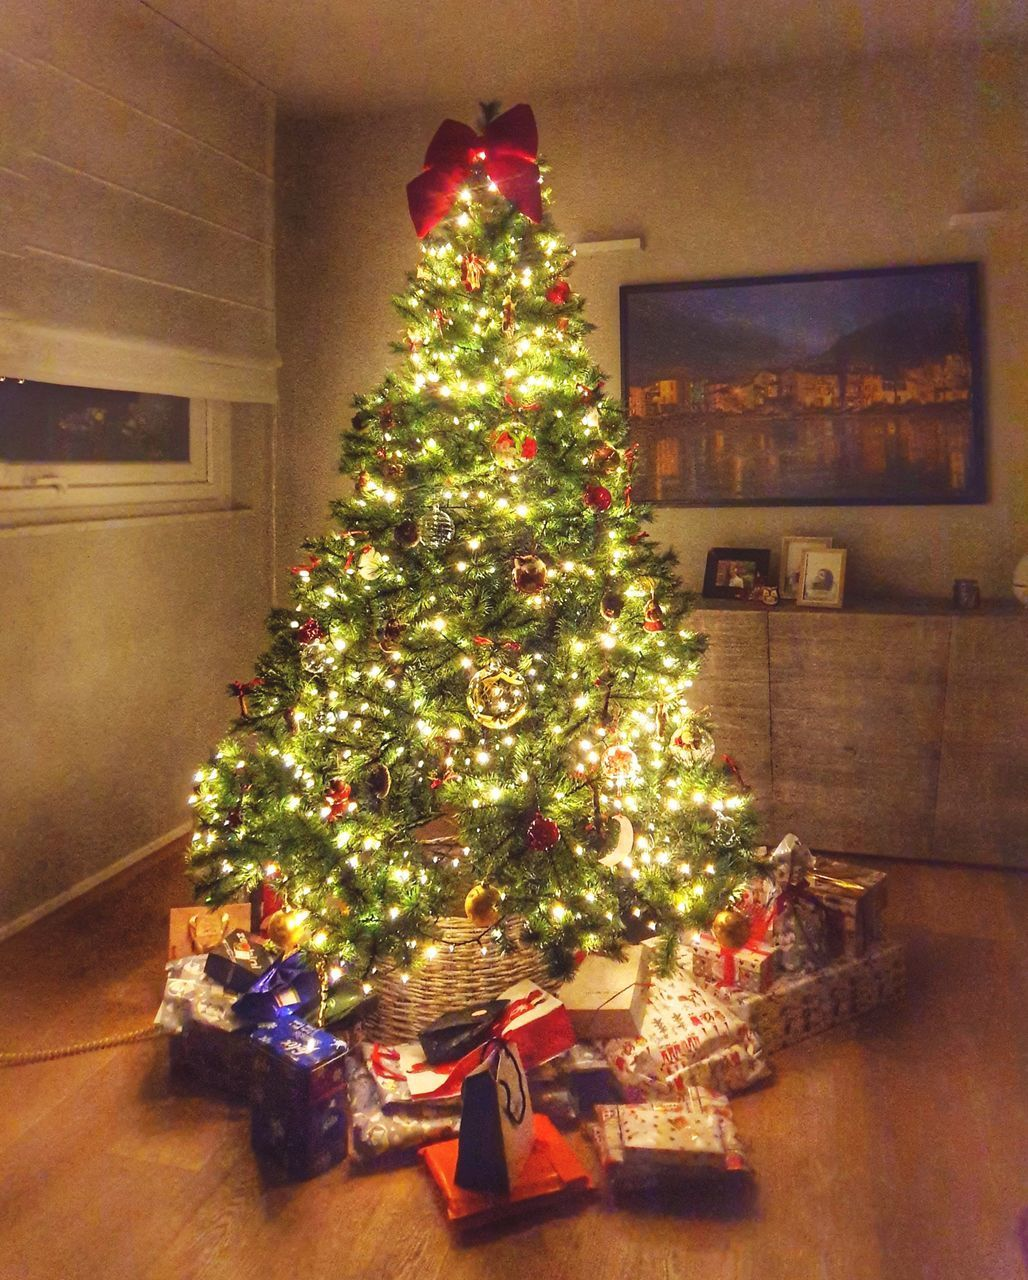 christmas, christmas tree, tree, celebration, holiday, christmas decoration, decoration, indoors, gift, illuminated, christmas lights, home interior, christmas ornament, celebration event, holiday - event, flooring, event, no people